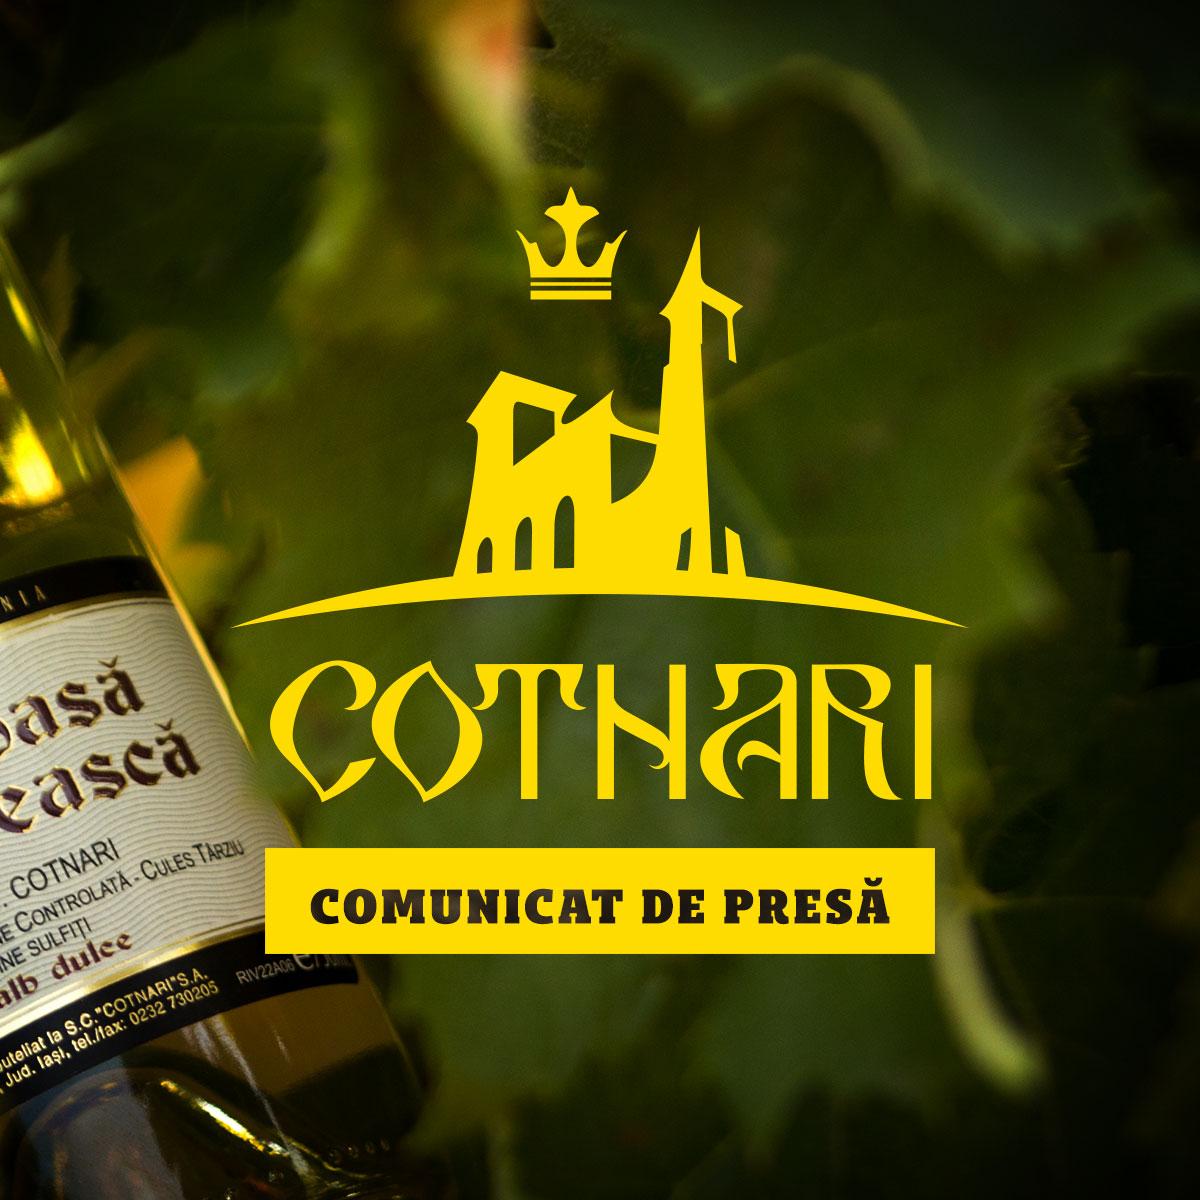 https://www.cotnari.ro/continut/uploads/2017/08/comunicat12.jpg